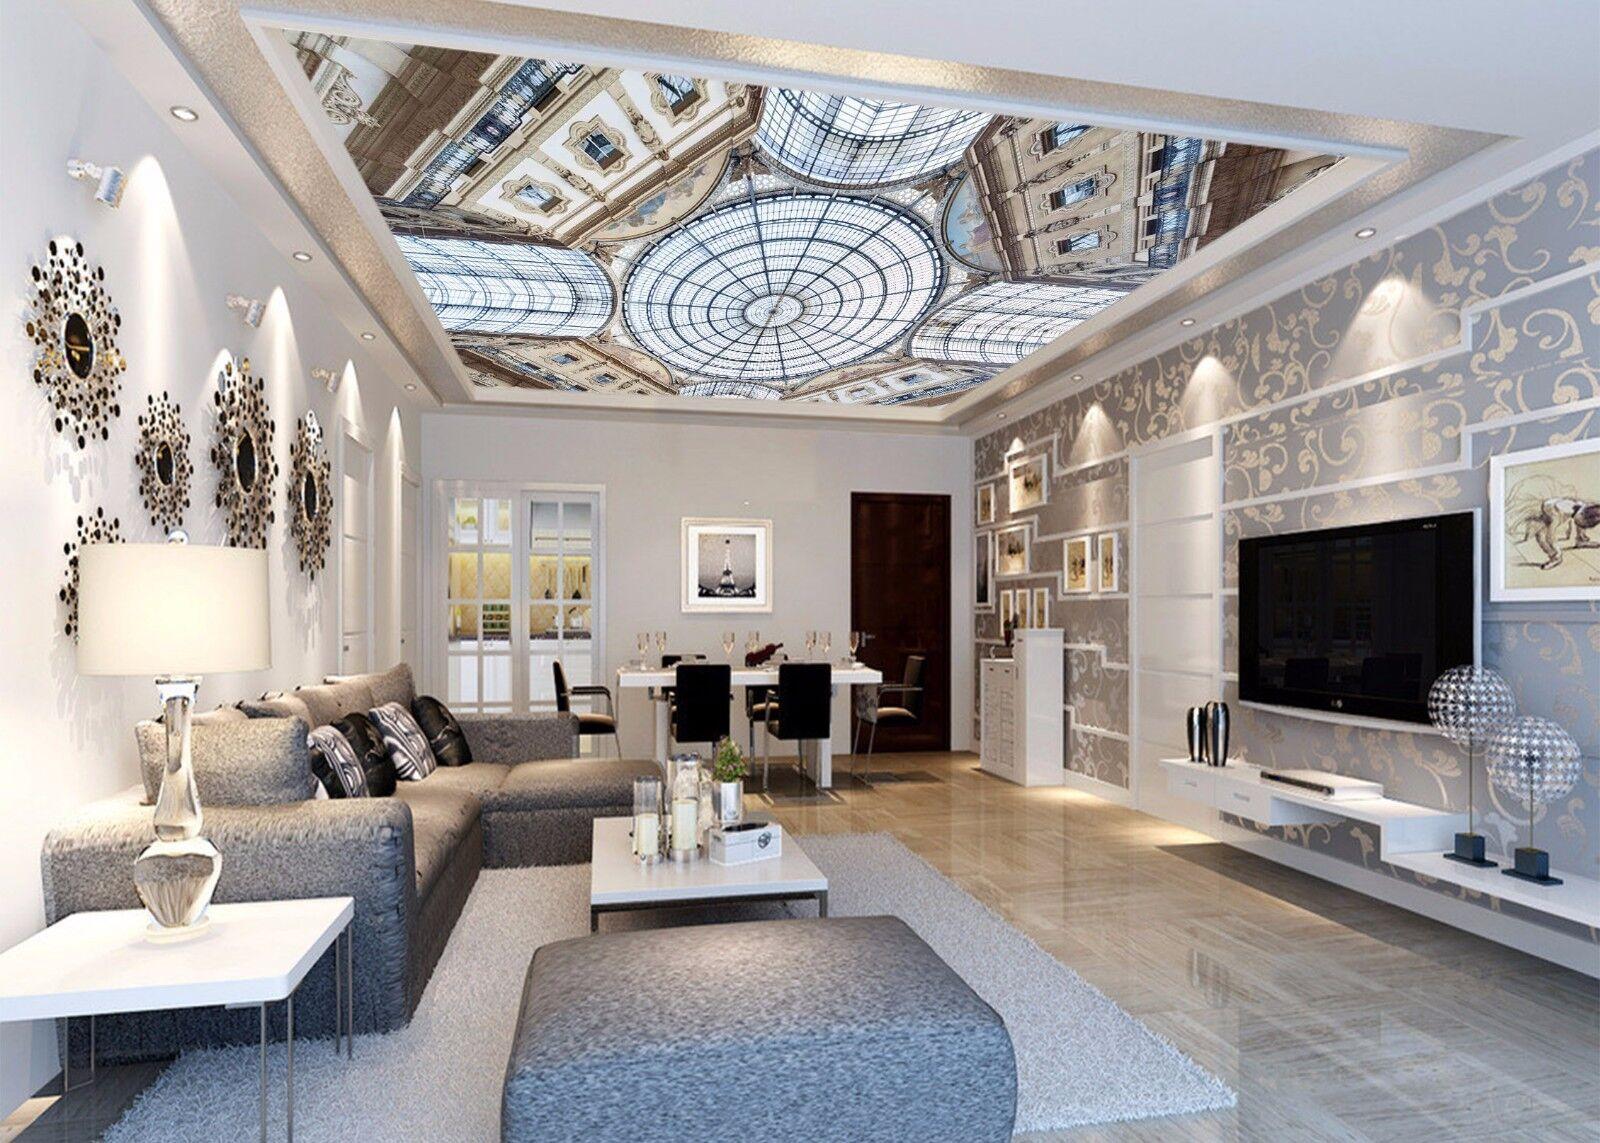 3D House Roof 885 Ceiling WallPaper Murals Wall Print Decal Deco AJ WALLPAPER GB